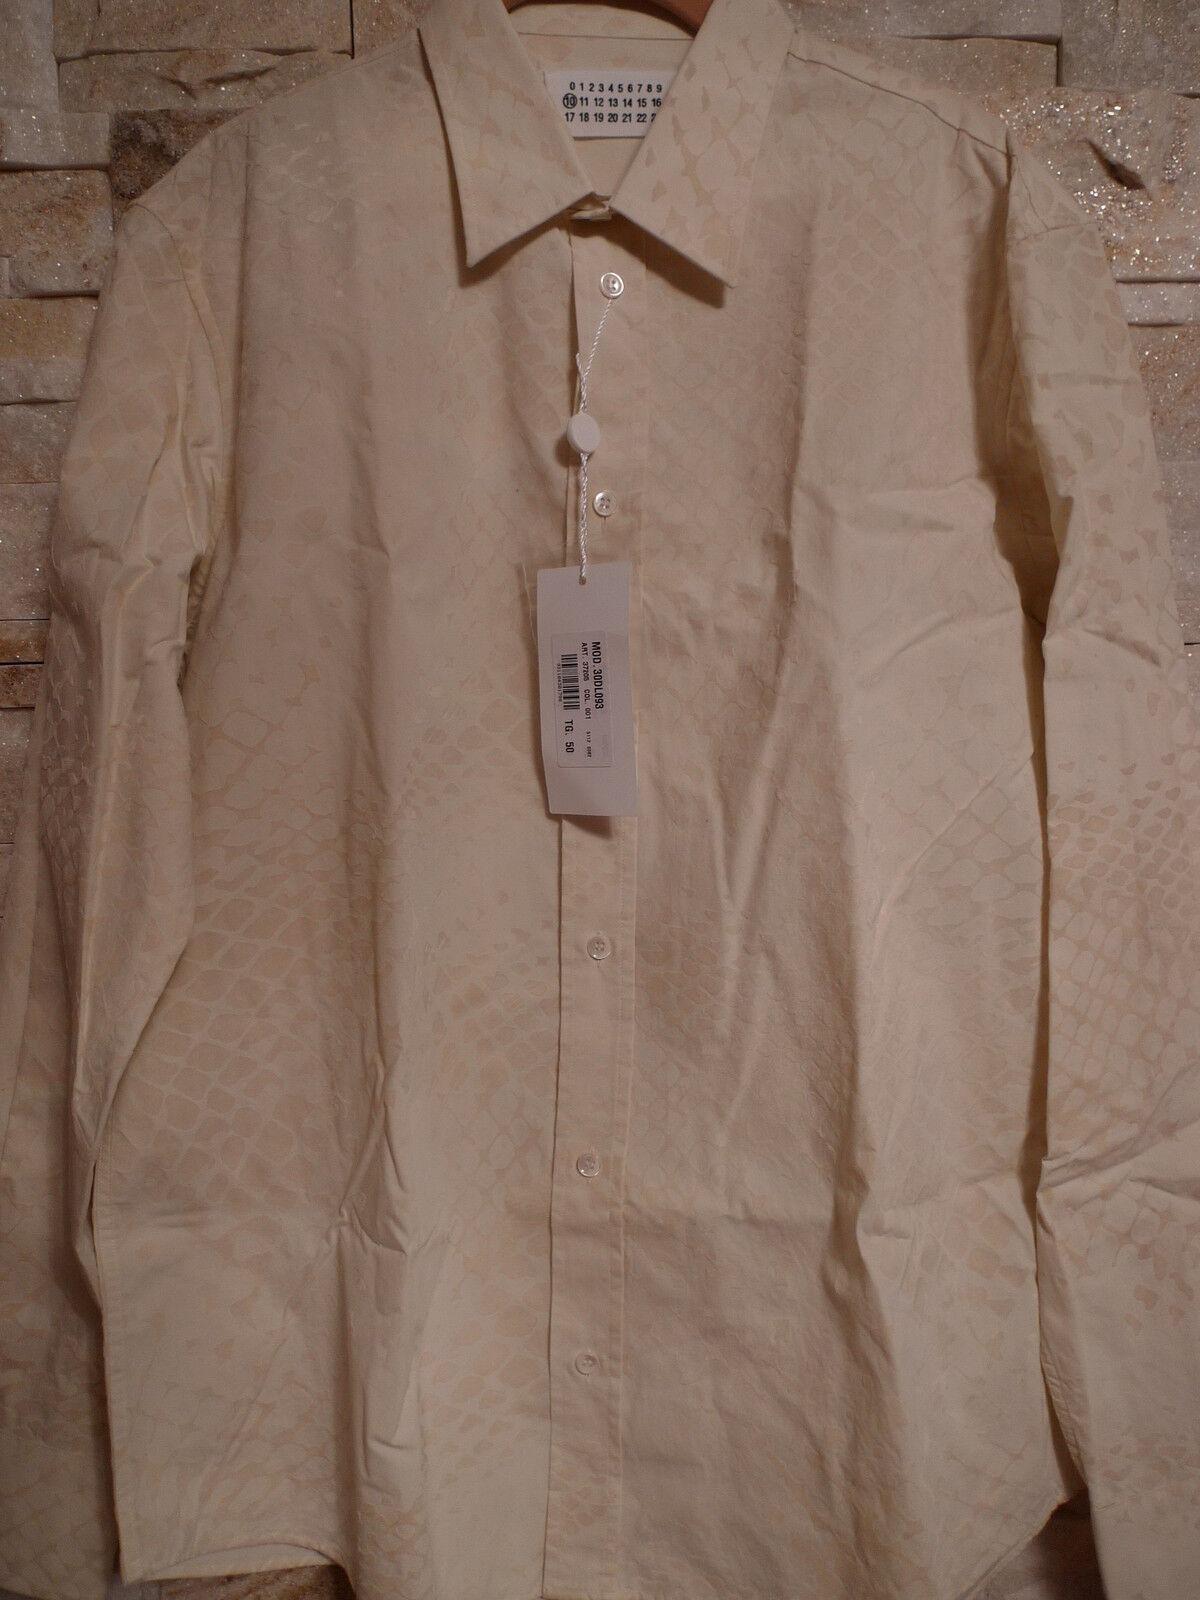 670. MAISON MARTIN MARGIELA CREAM Farbe hemd ITALY Größe 50 M